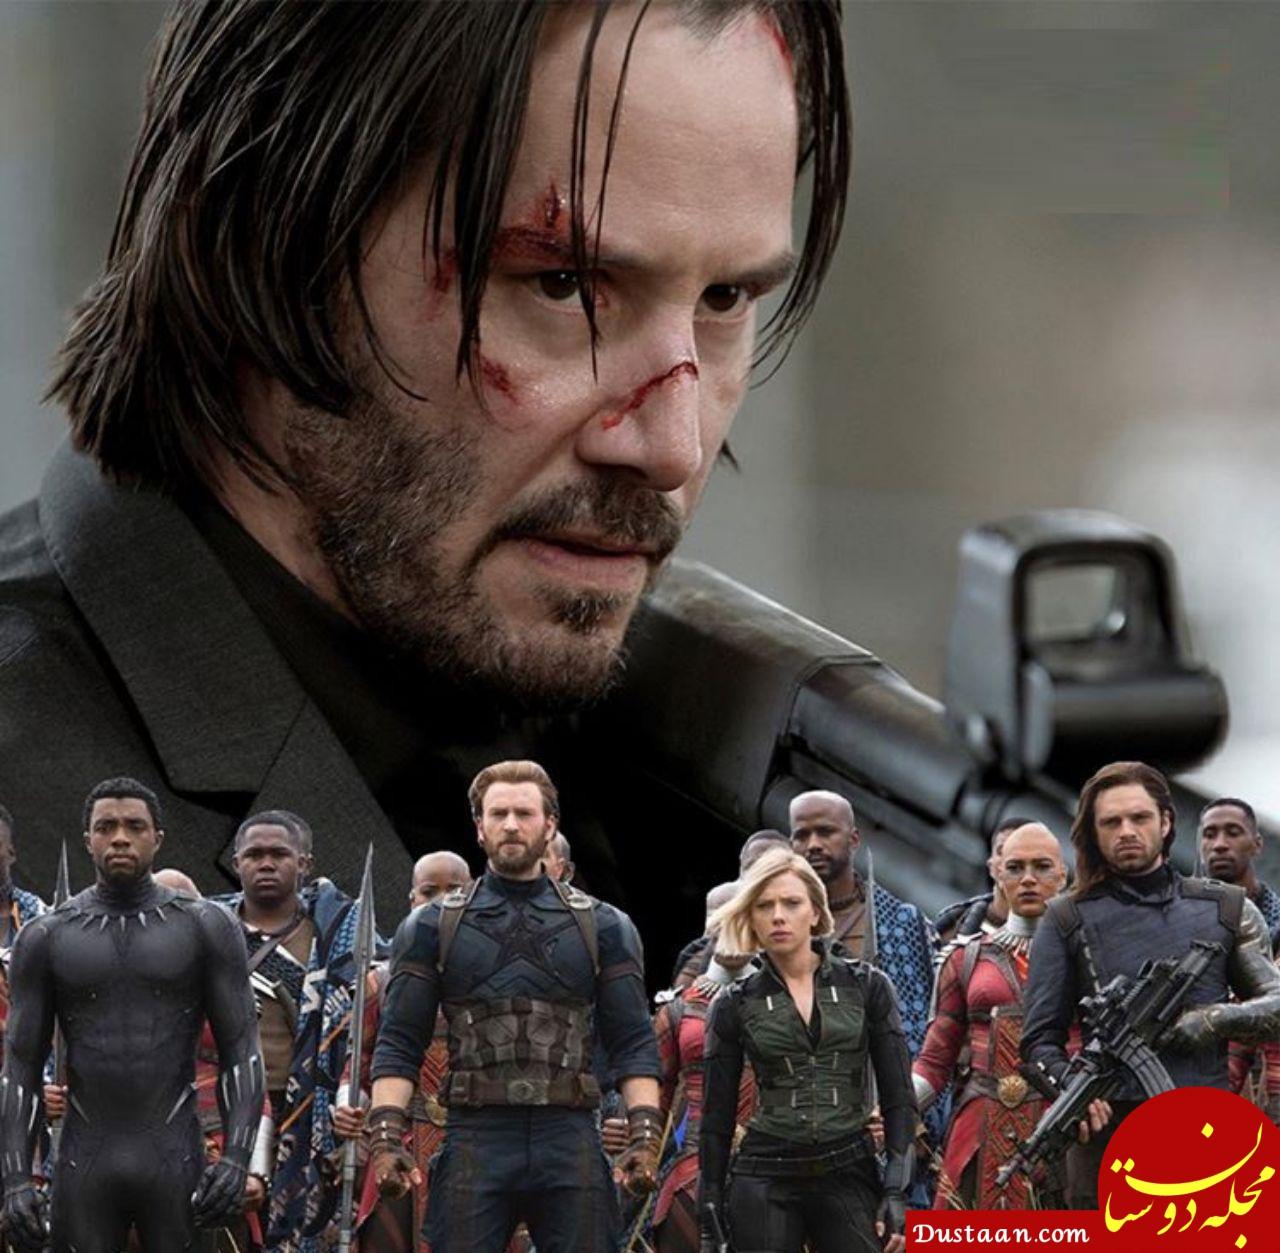 www.dustaan.com «جان ویک 3» به صدرنشینی «انتقام جویان» پایان داد